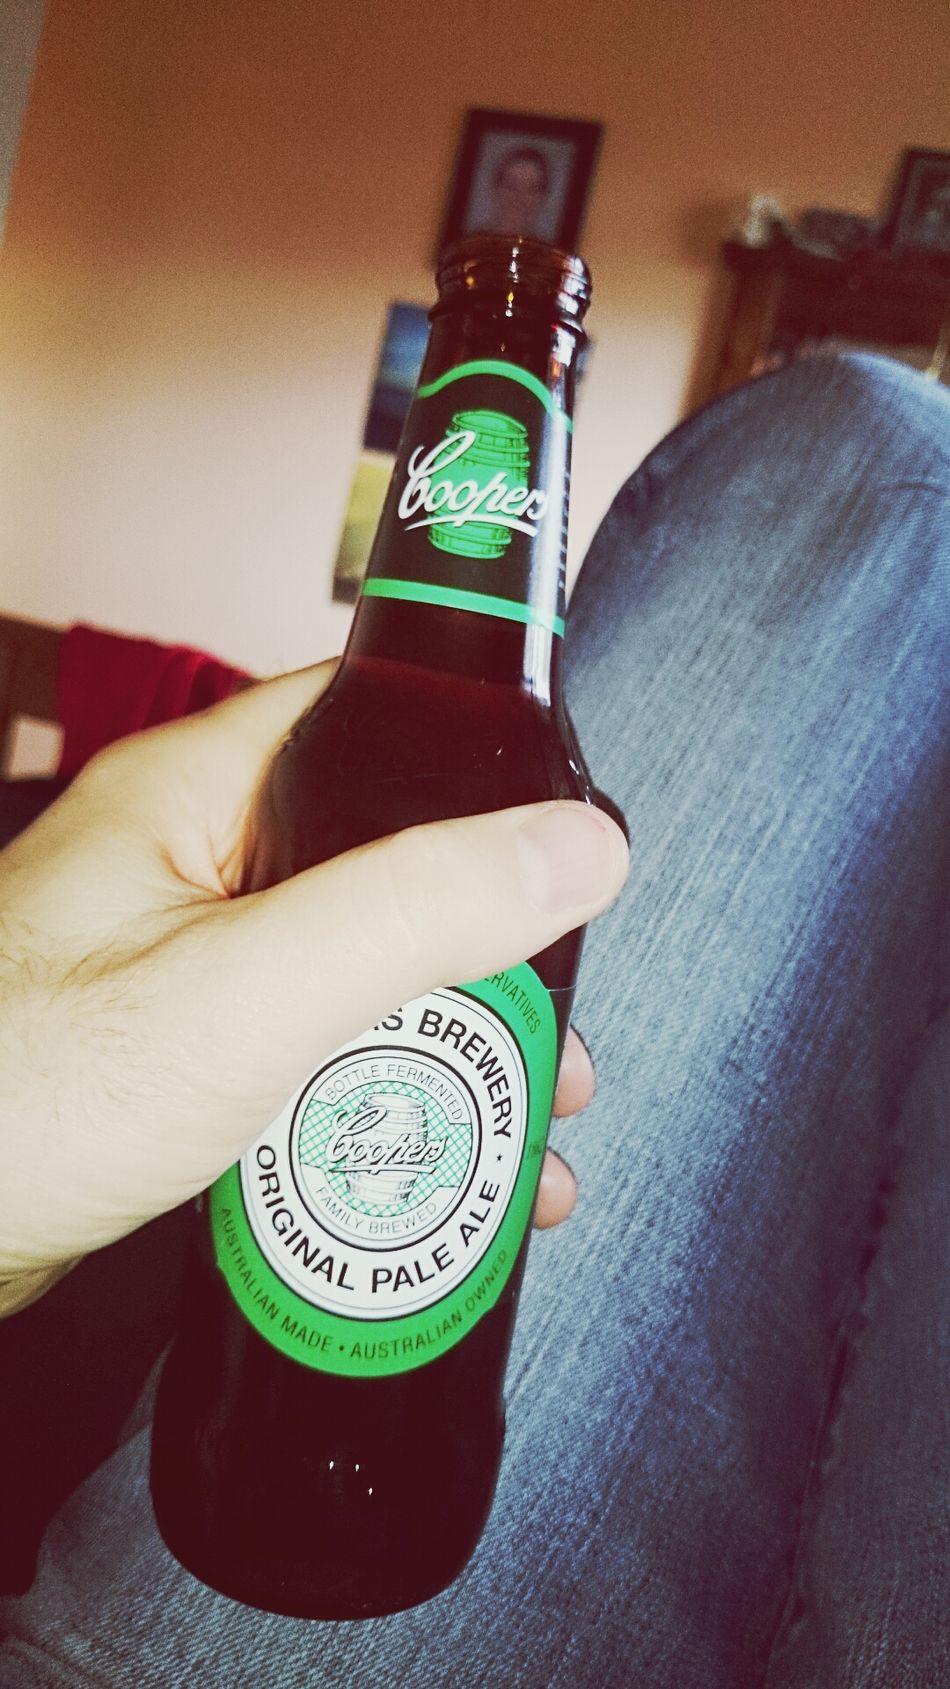 good tasty SA beer. Coopersbrewery